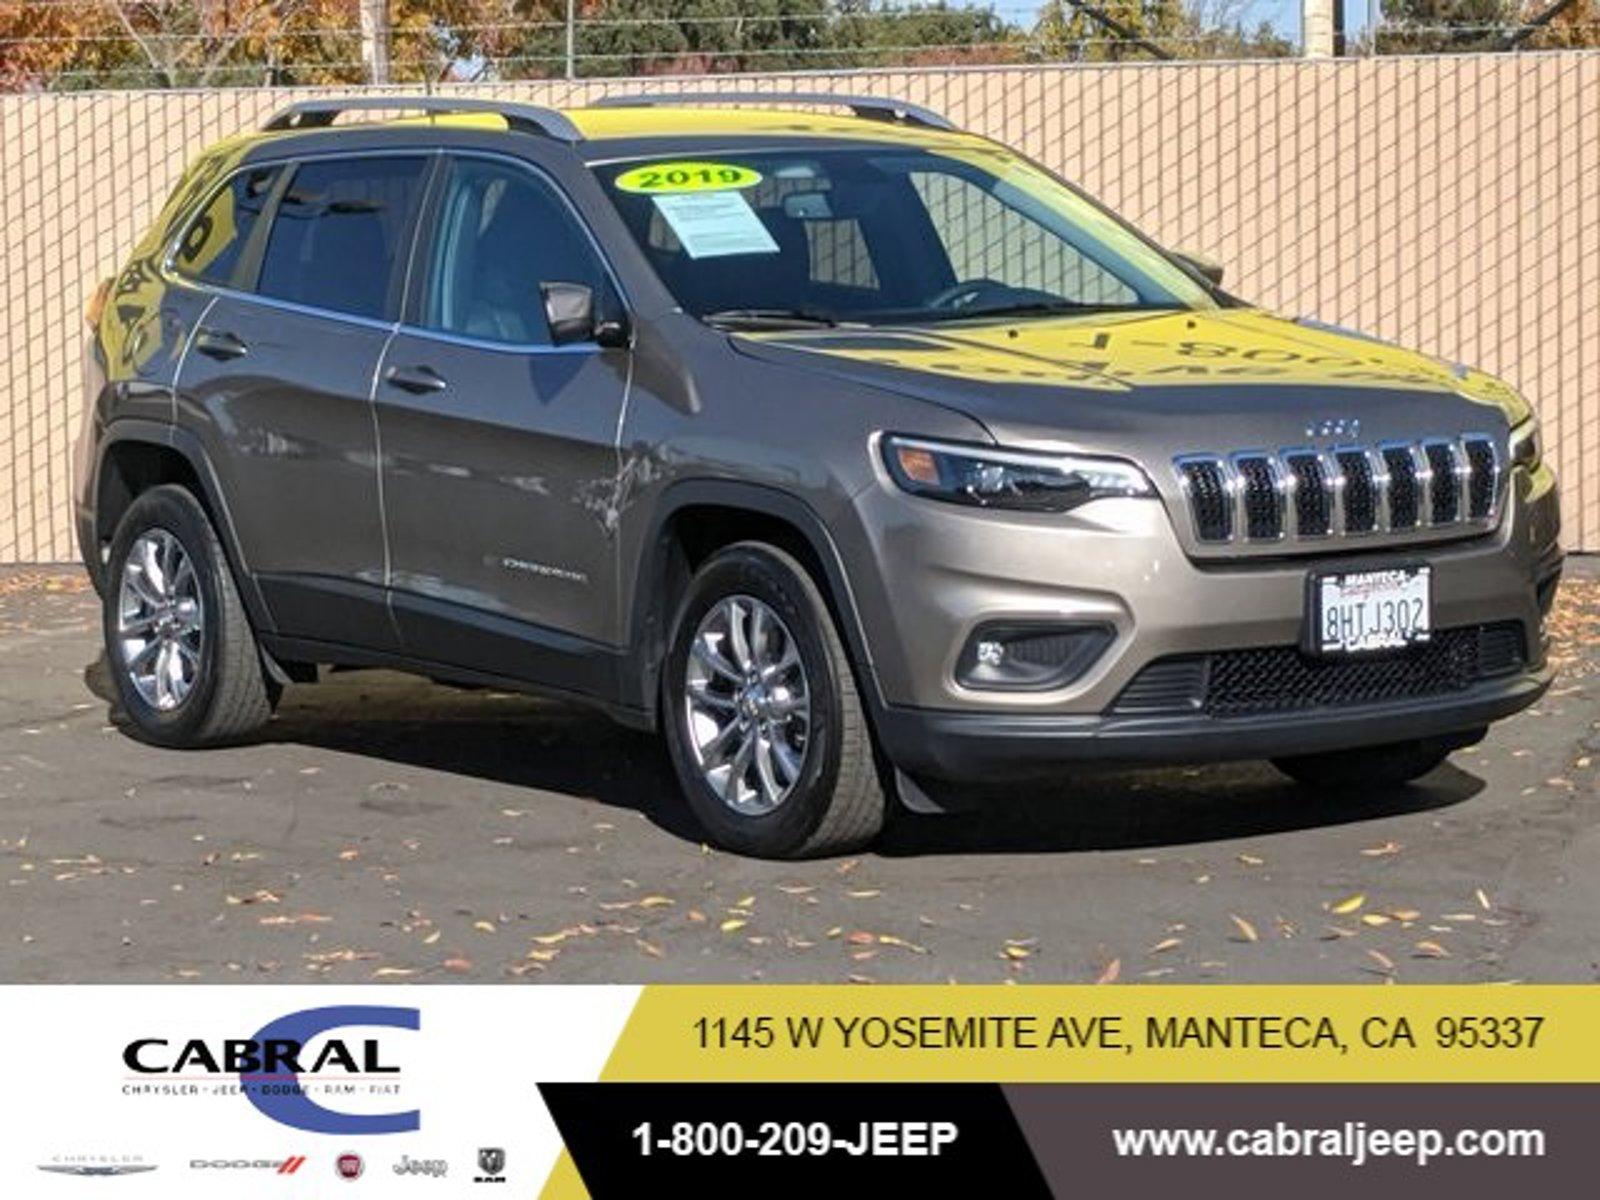 2019 Jeep Cherokee Latitude Plus Latitude Plus FWD Intercooled Turbo Premium Unleaded I-4 2.0 L/122 [0]